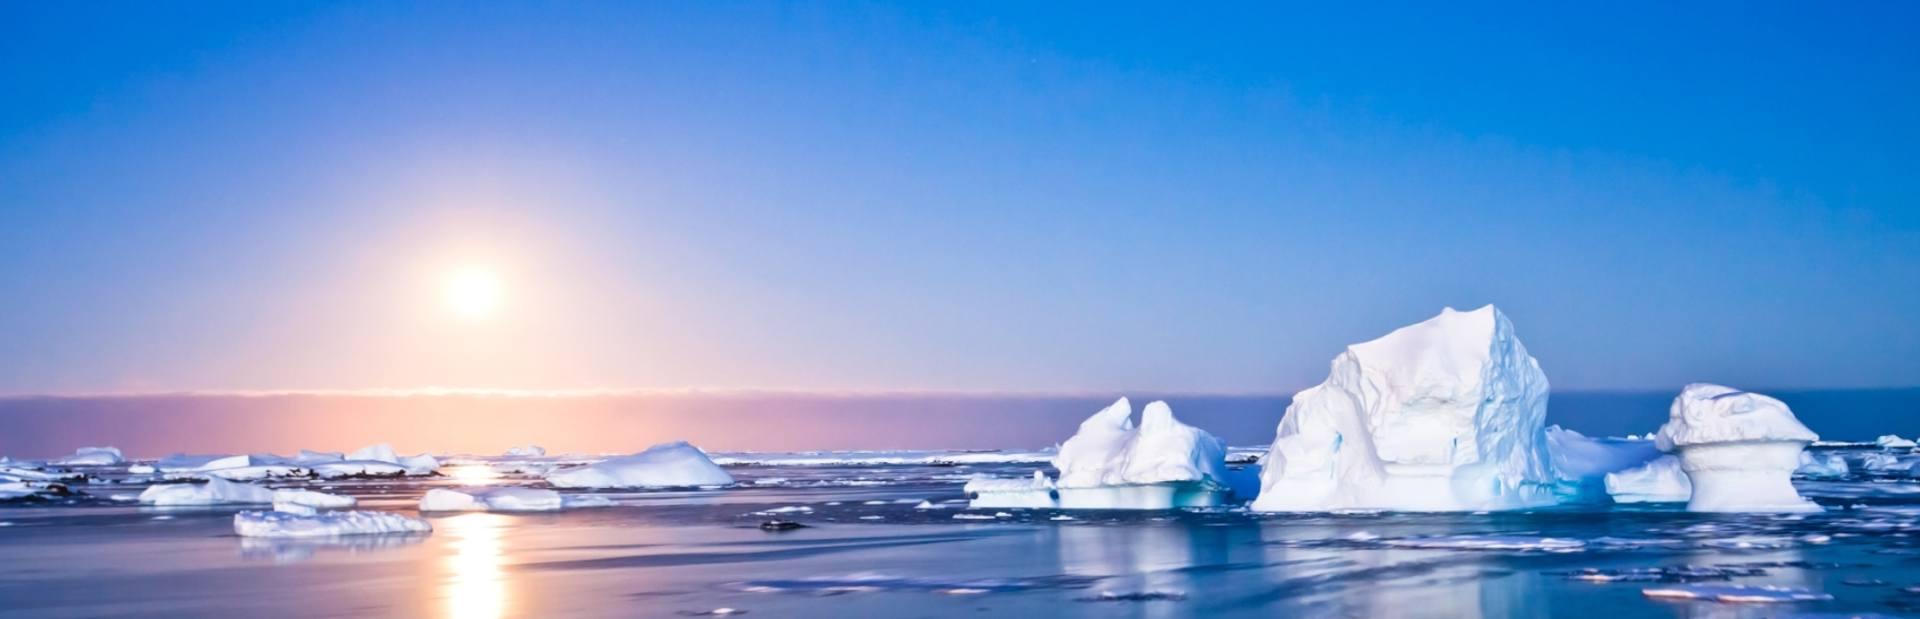 Antarctica climate photo